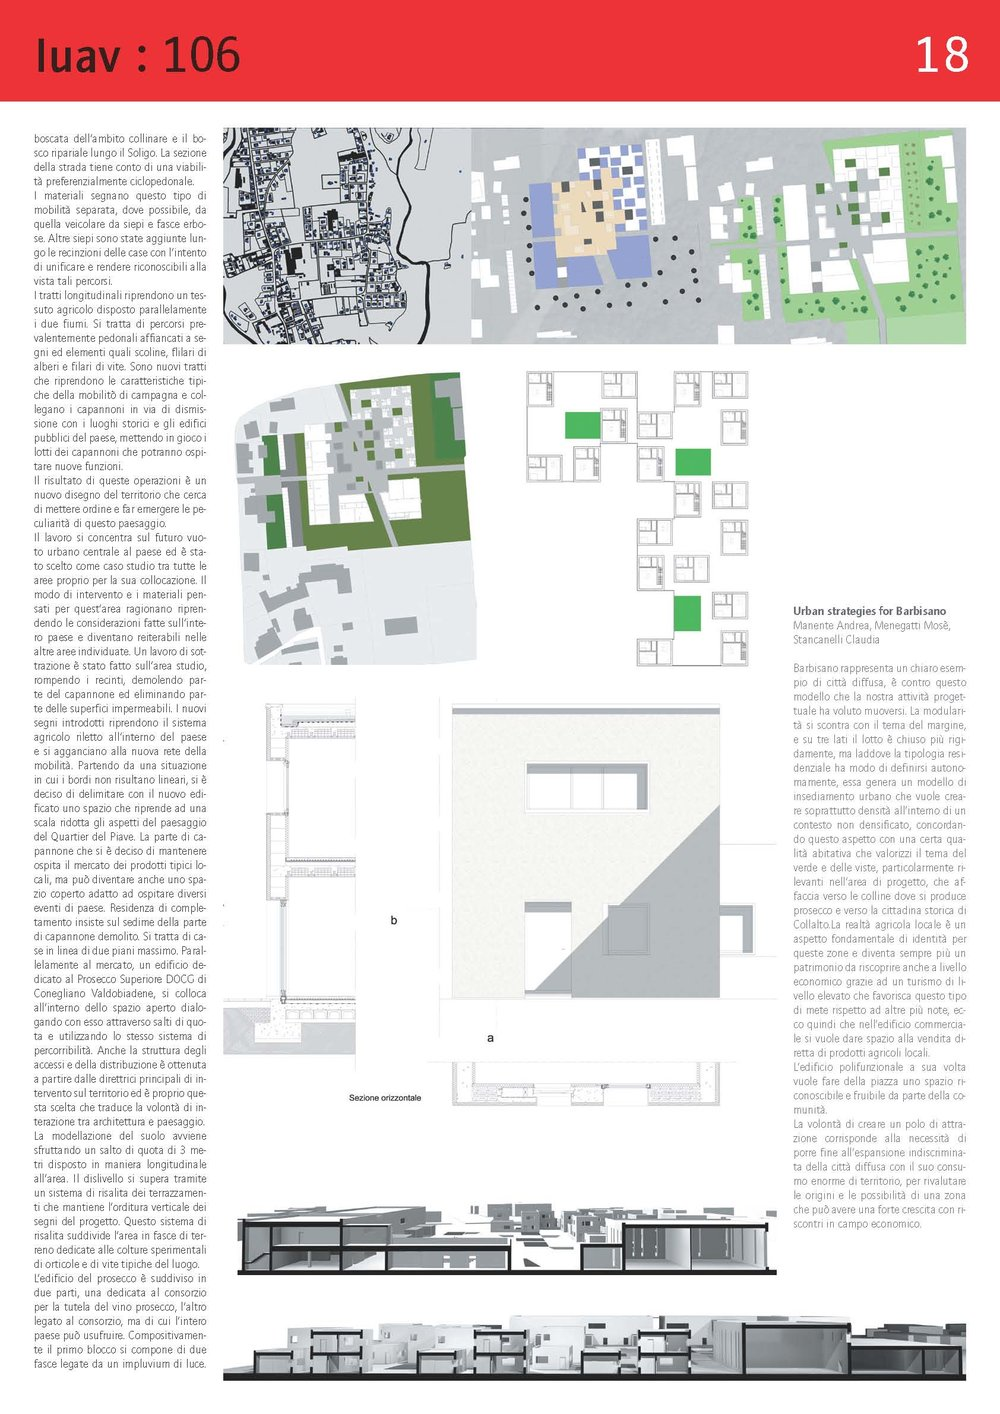 Copertine_Pagina_19.jpg